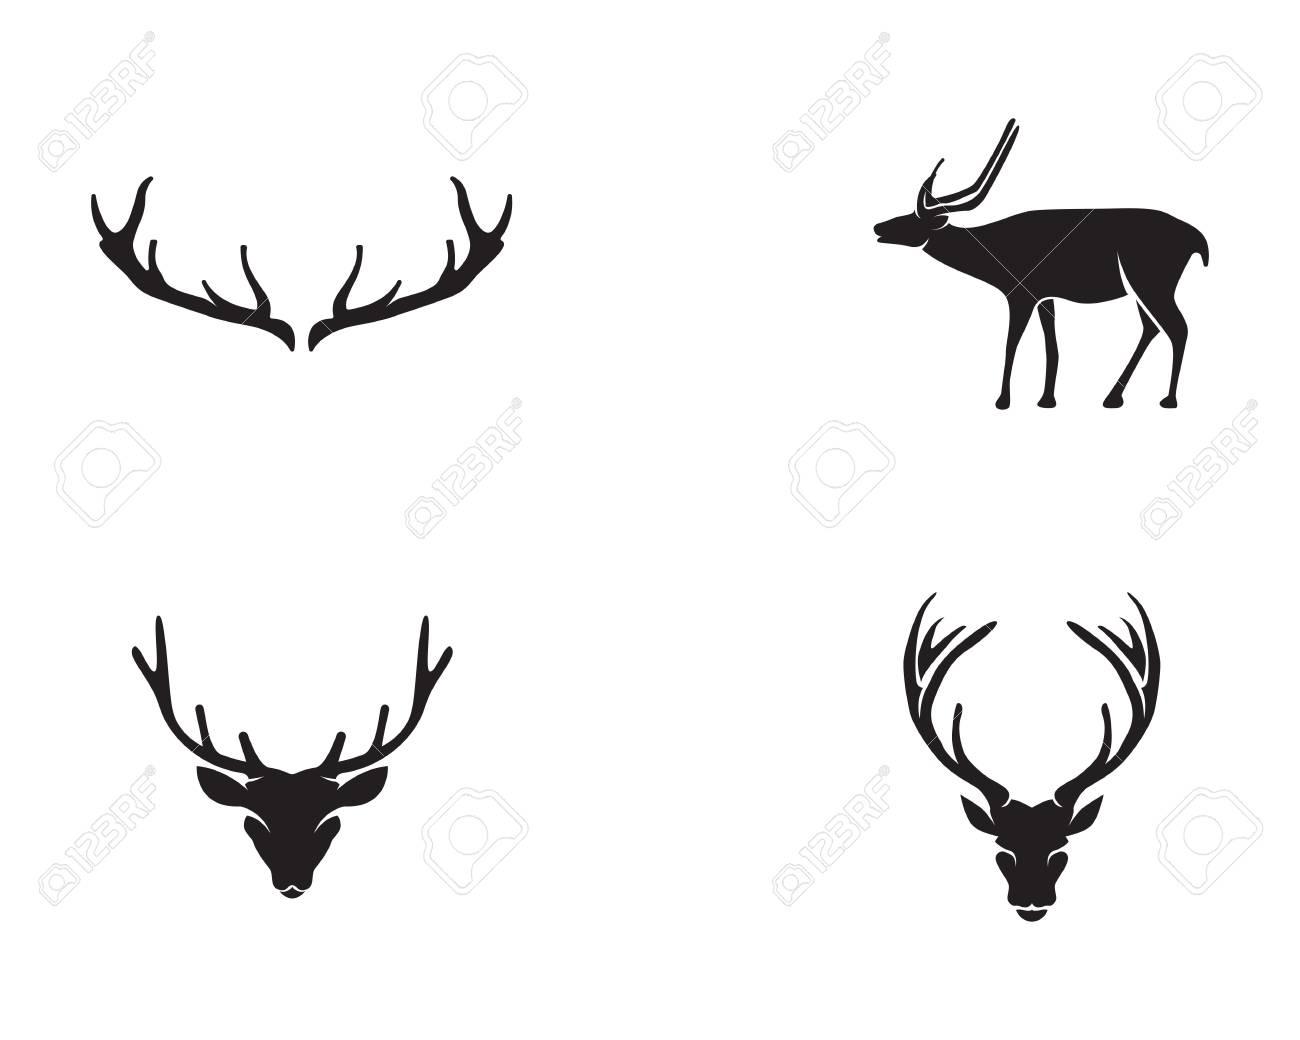 Head Deer Animals Logo Black Silhouete Icons Stock Vector